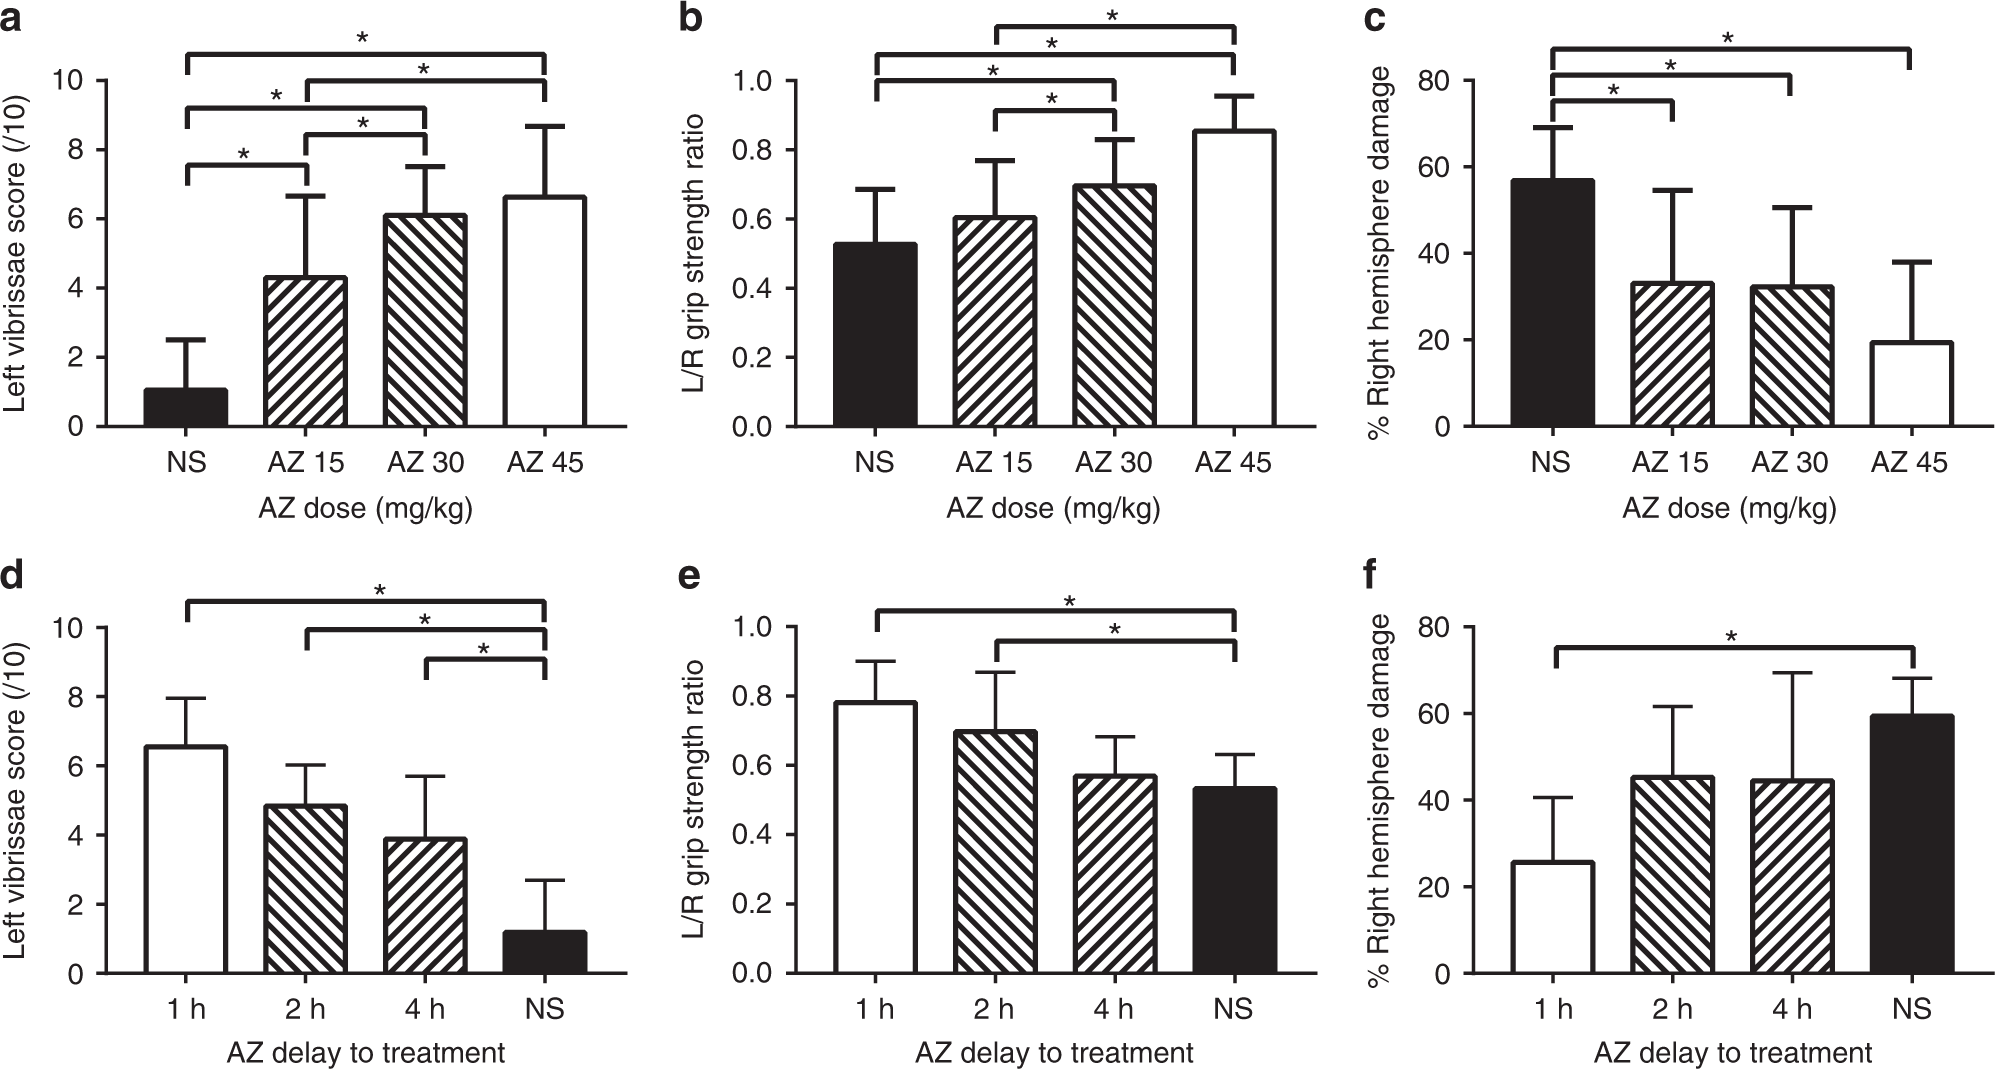 Repurposing azithromycin for neonatal neuroprotection